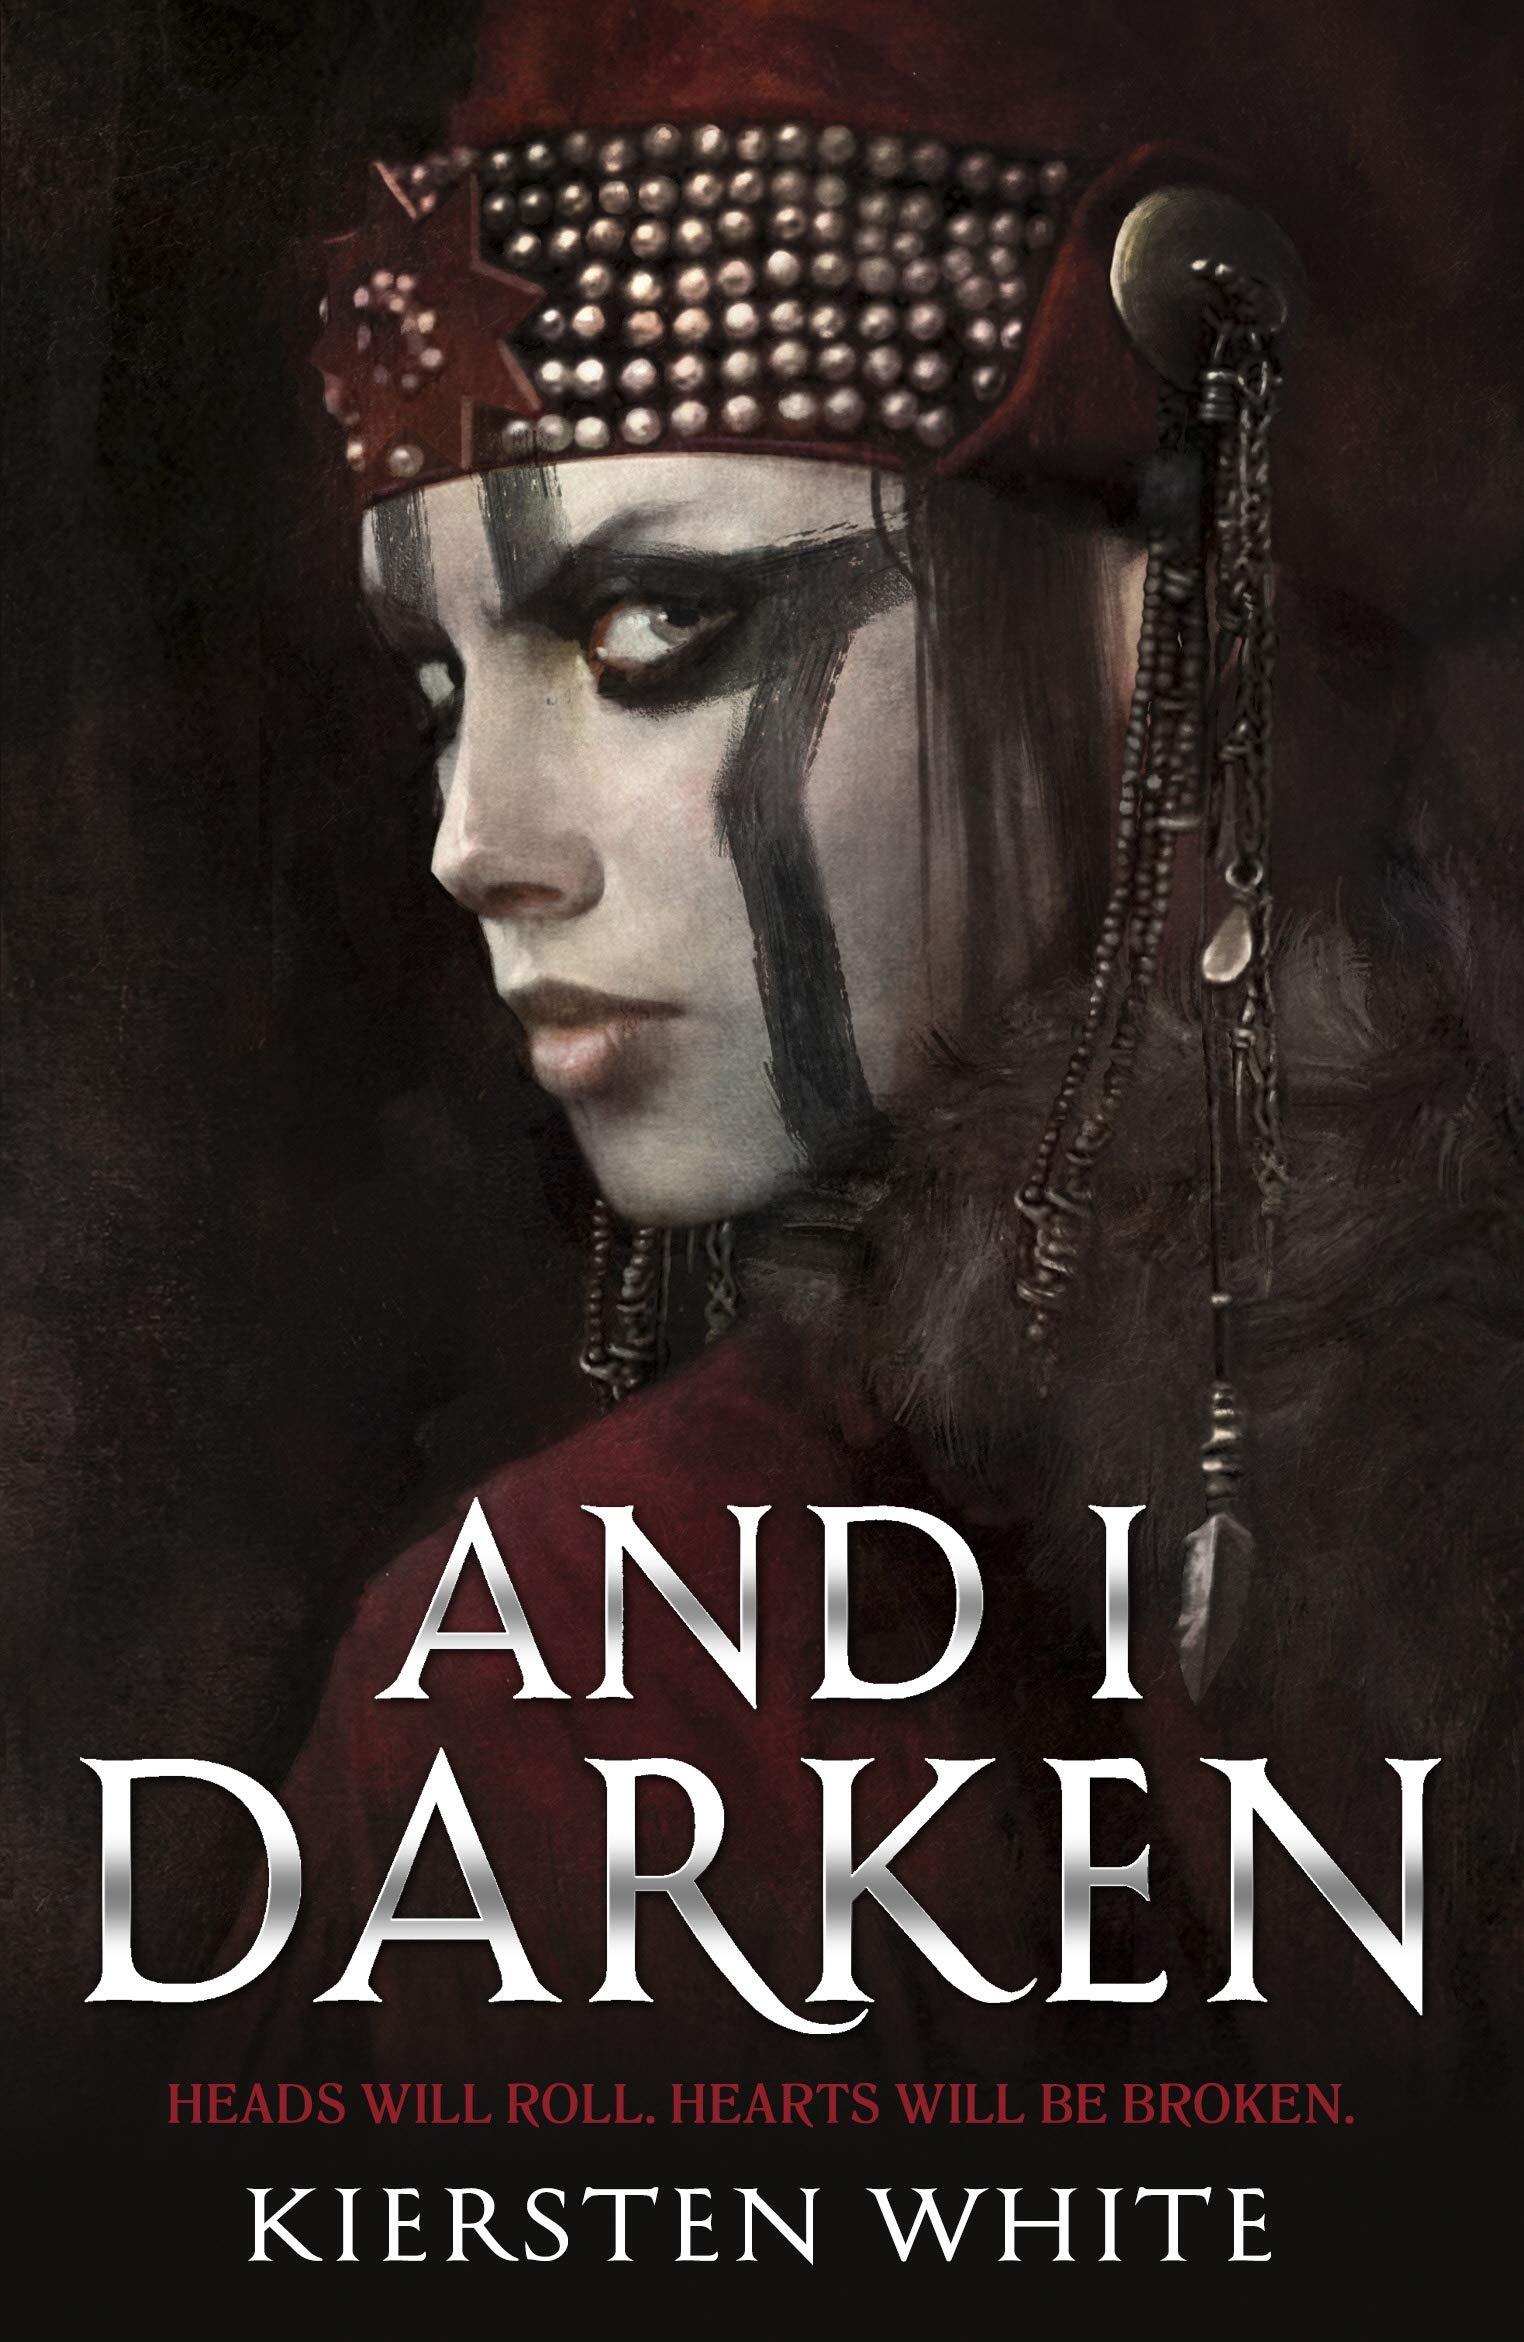 And I Darken (The Conquerors Trilogy): Amazon.es: Kiersten White: Libros en idiomas extranjeros